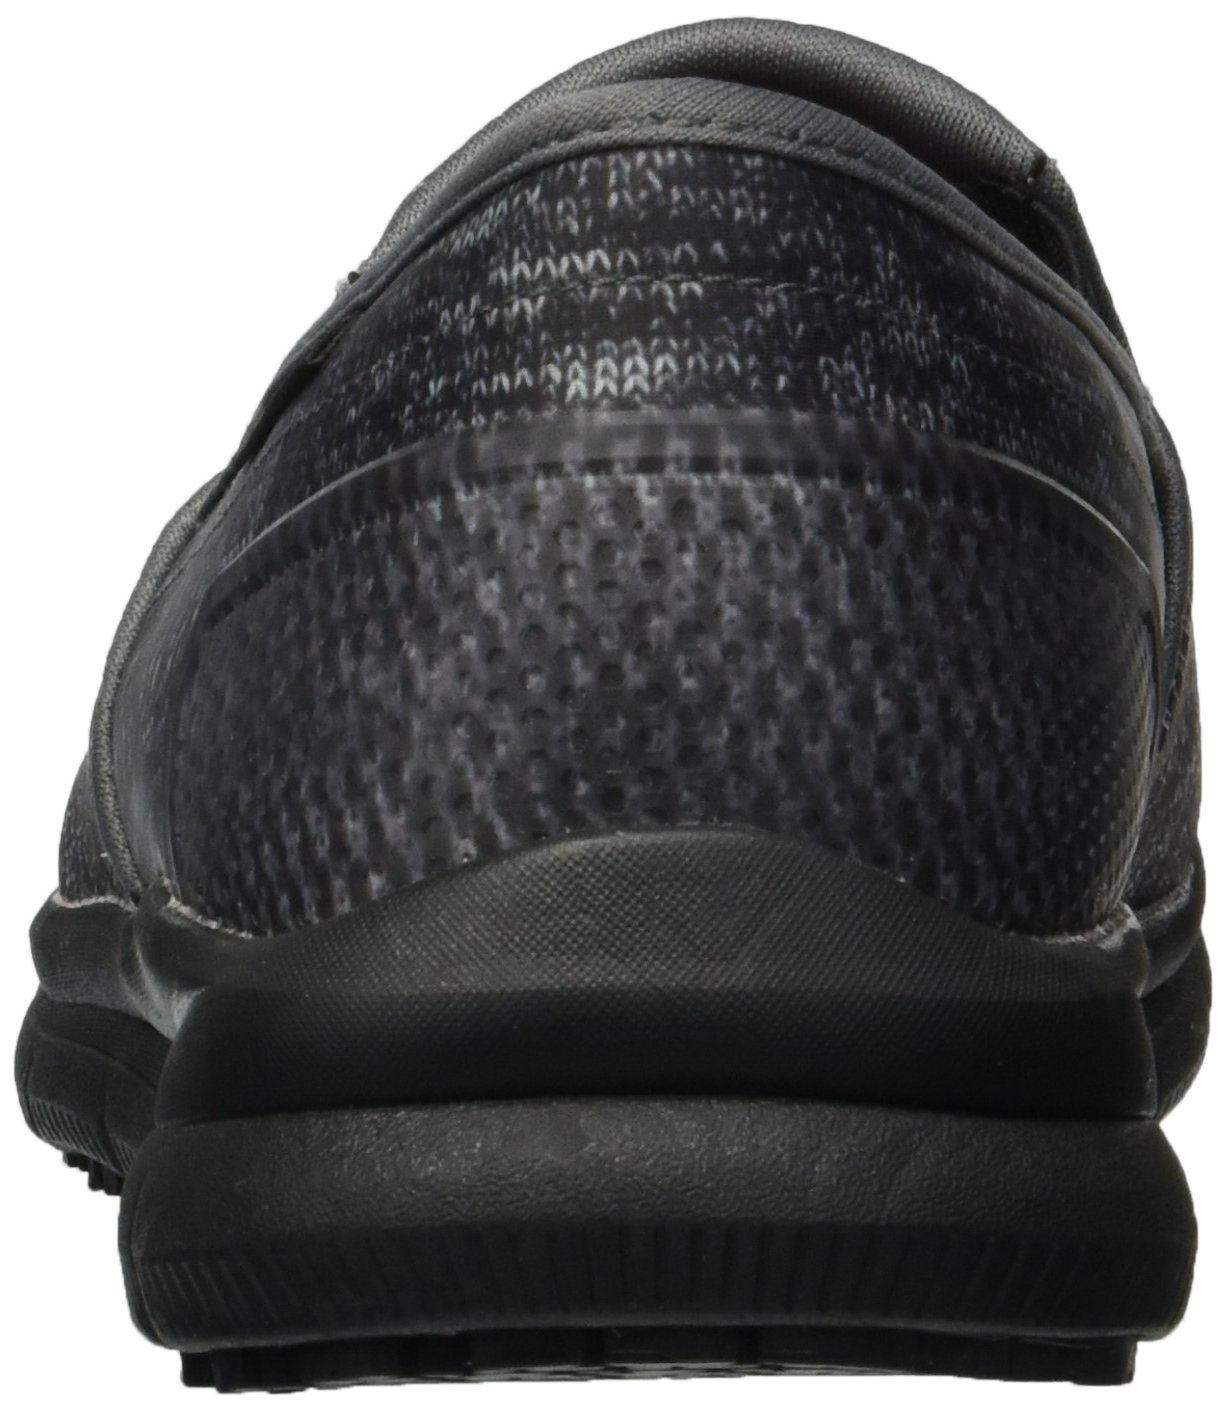 39f047f6b367 ... Skechers Women s Comfort Flex Hc Pro Pro Pro Sr Ii Health Care  Professional Shoe B0778XHT73 7 ...